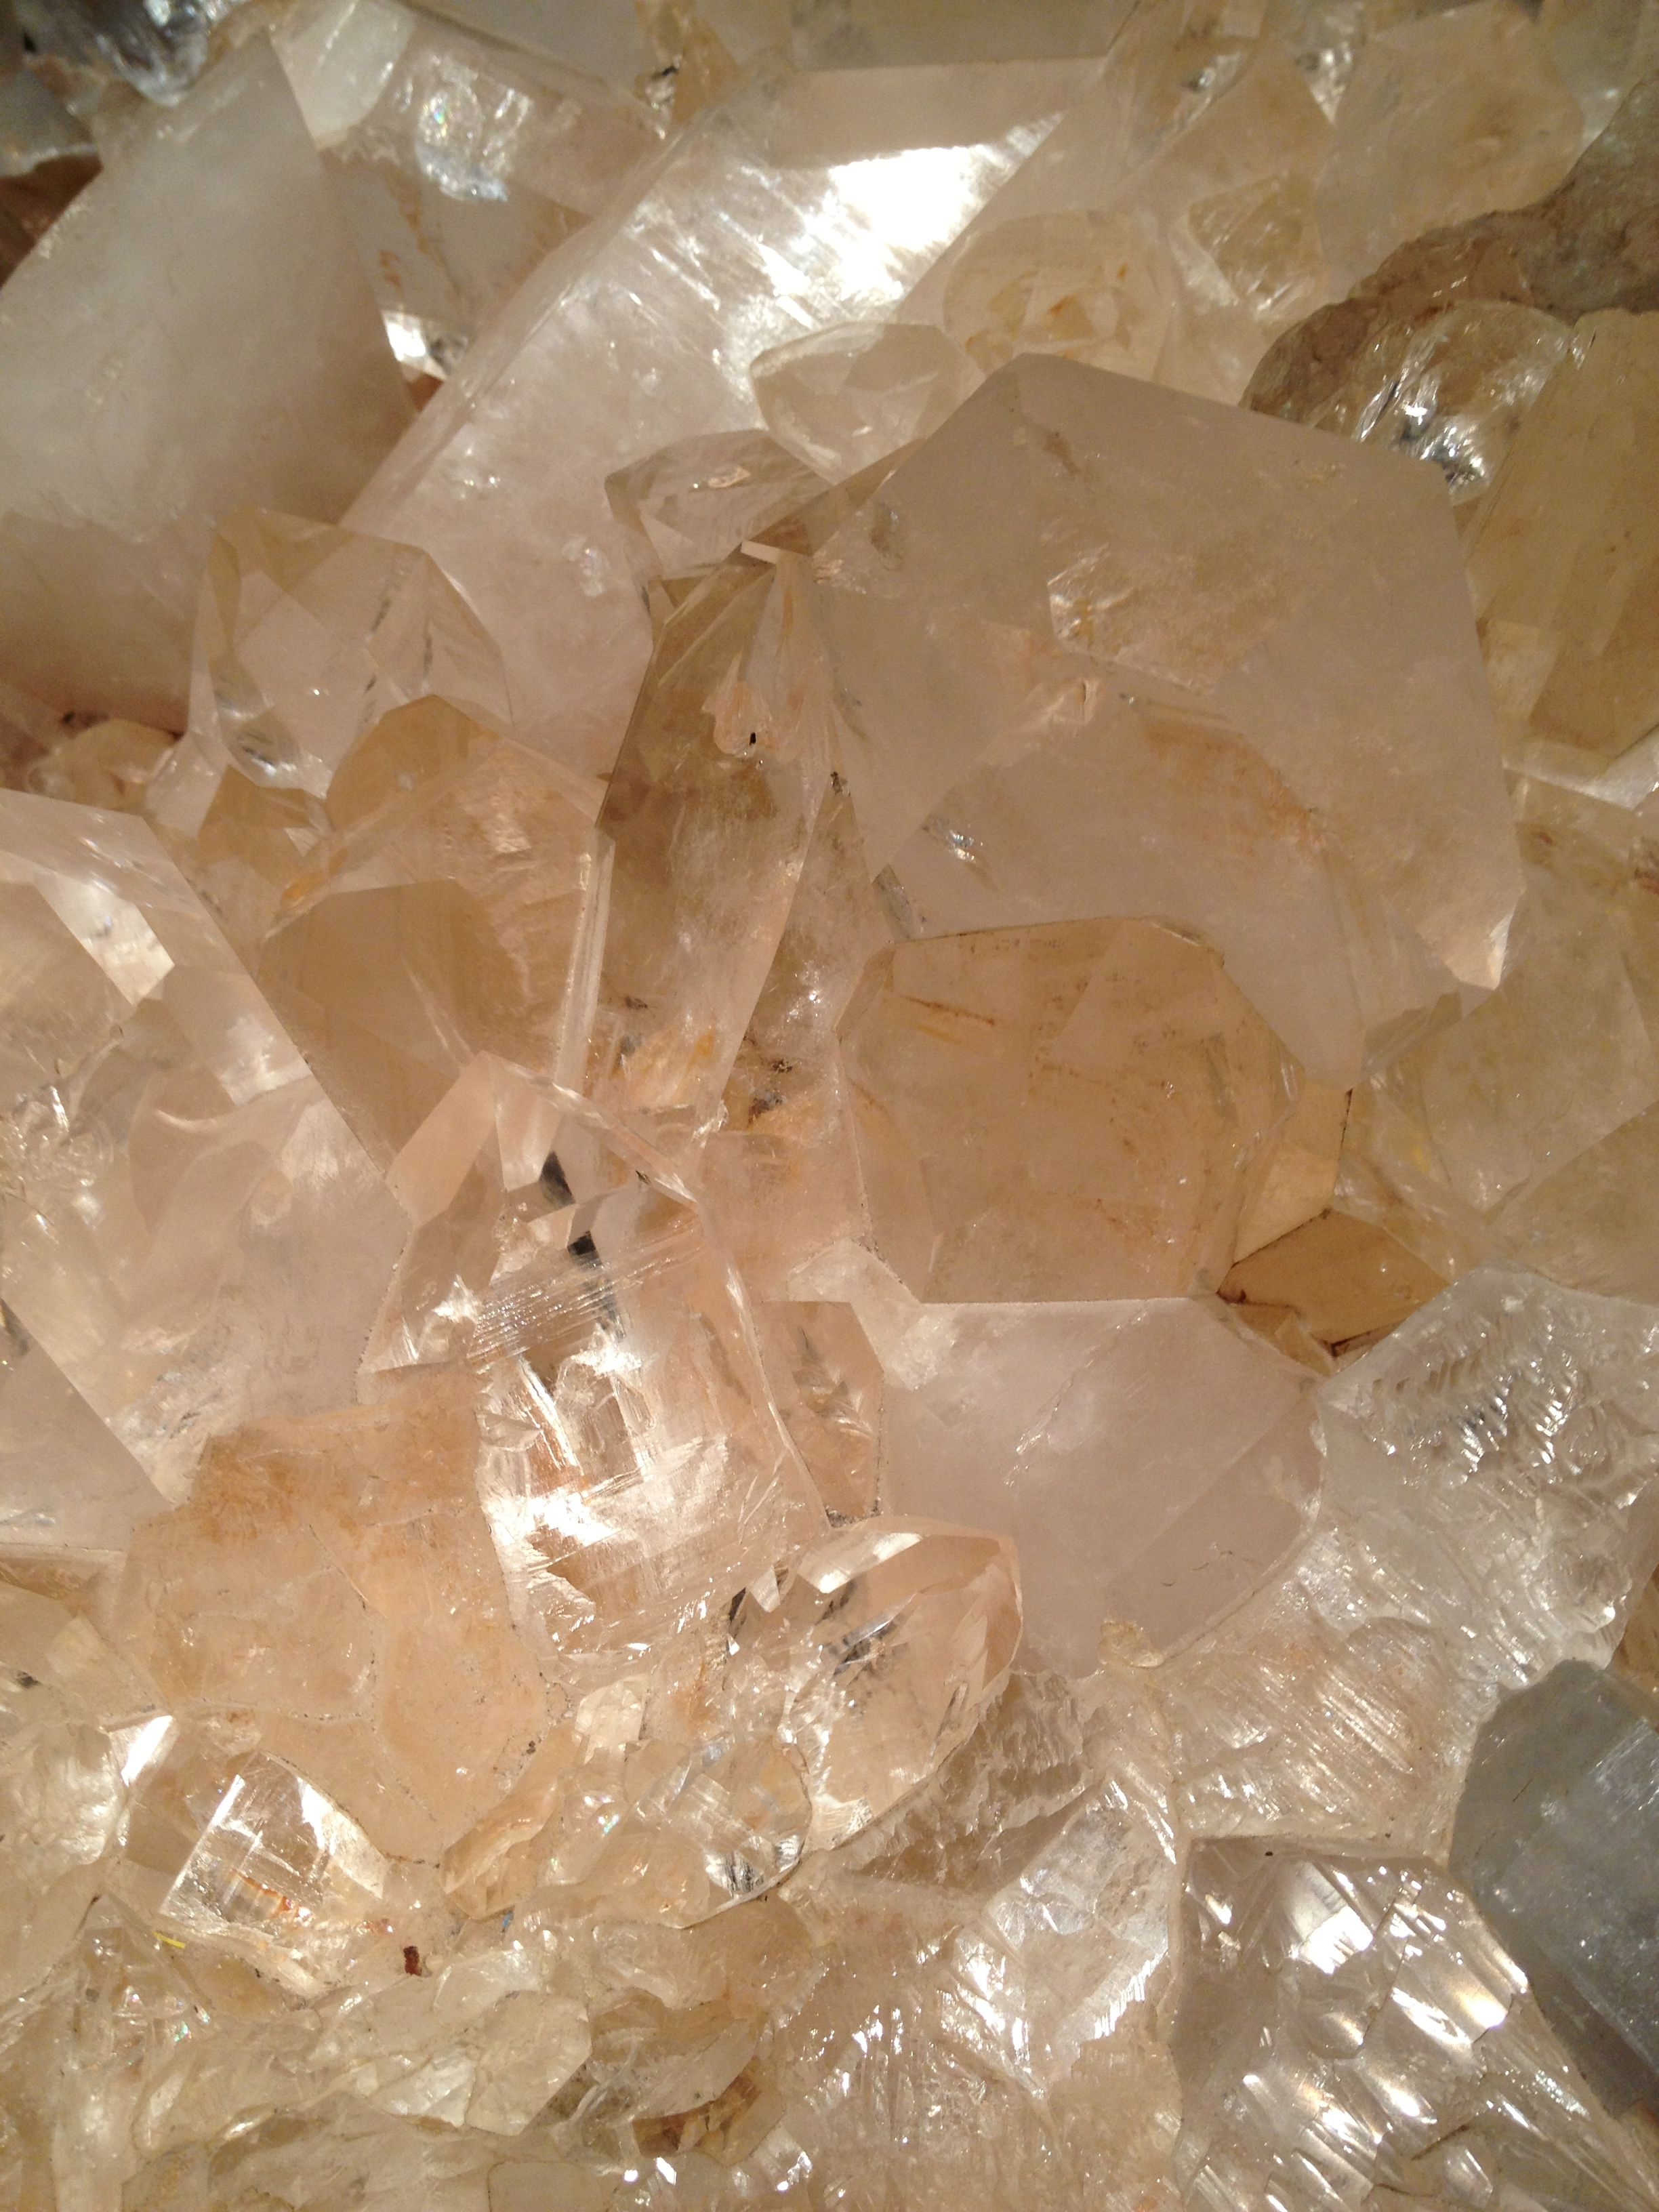 Crystal from Idar-Oberstein, Germany